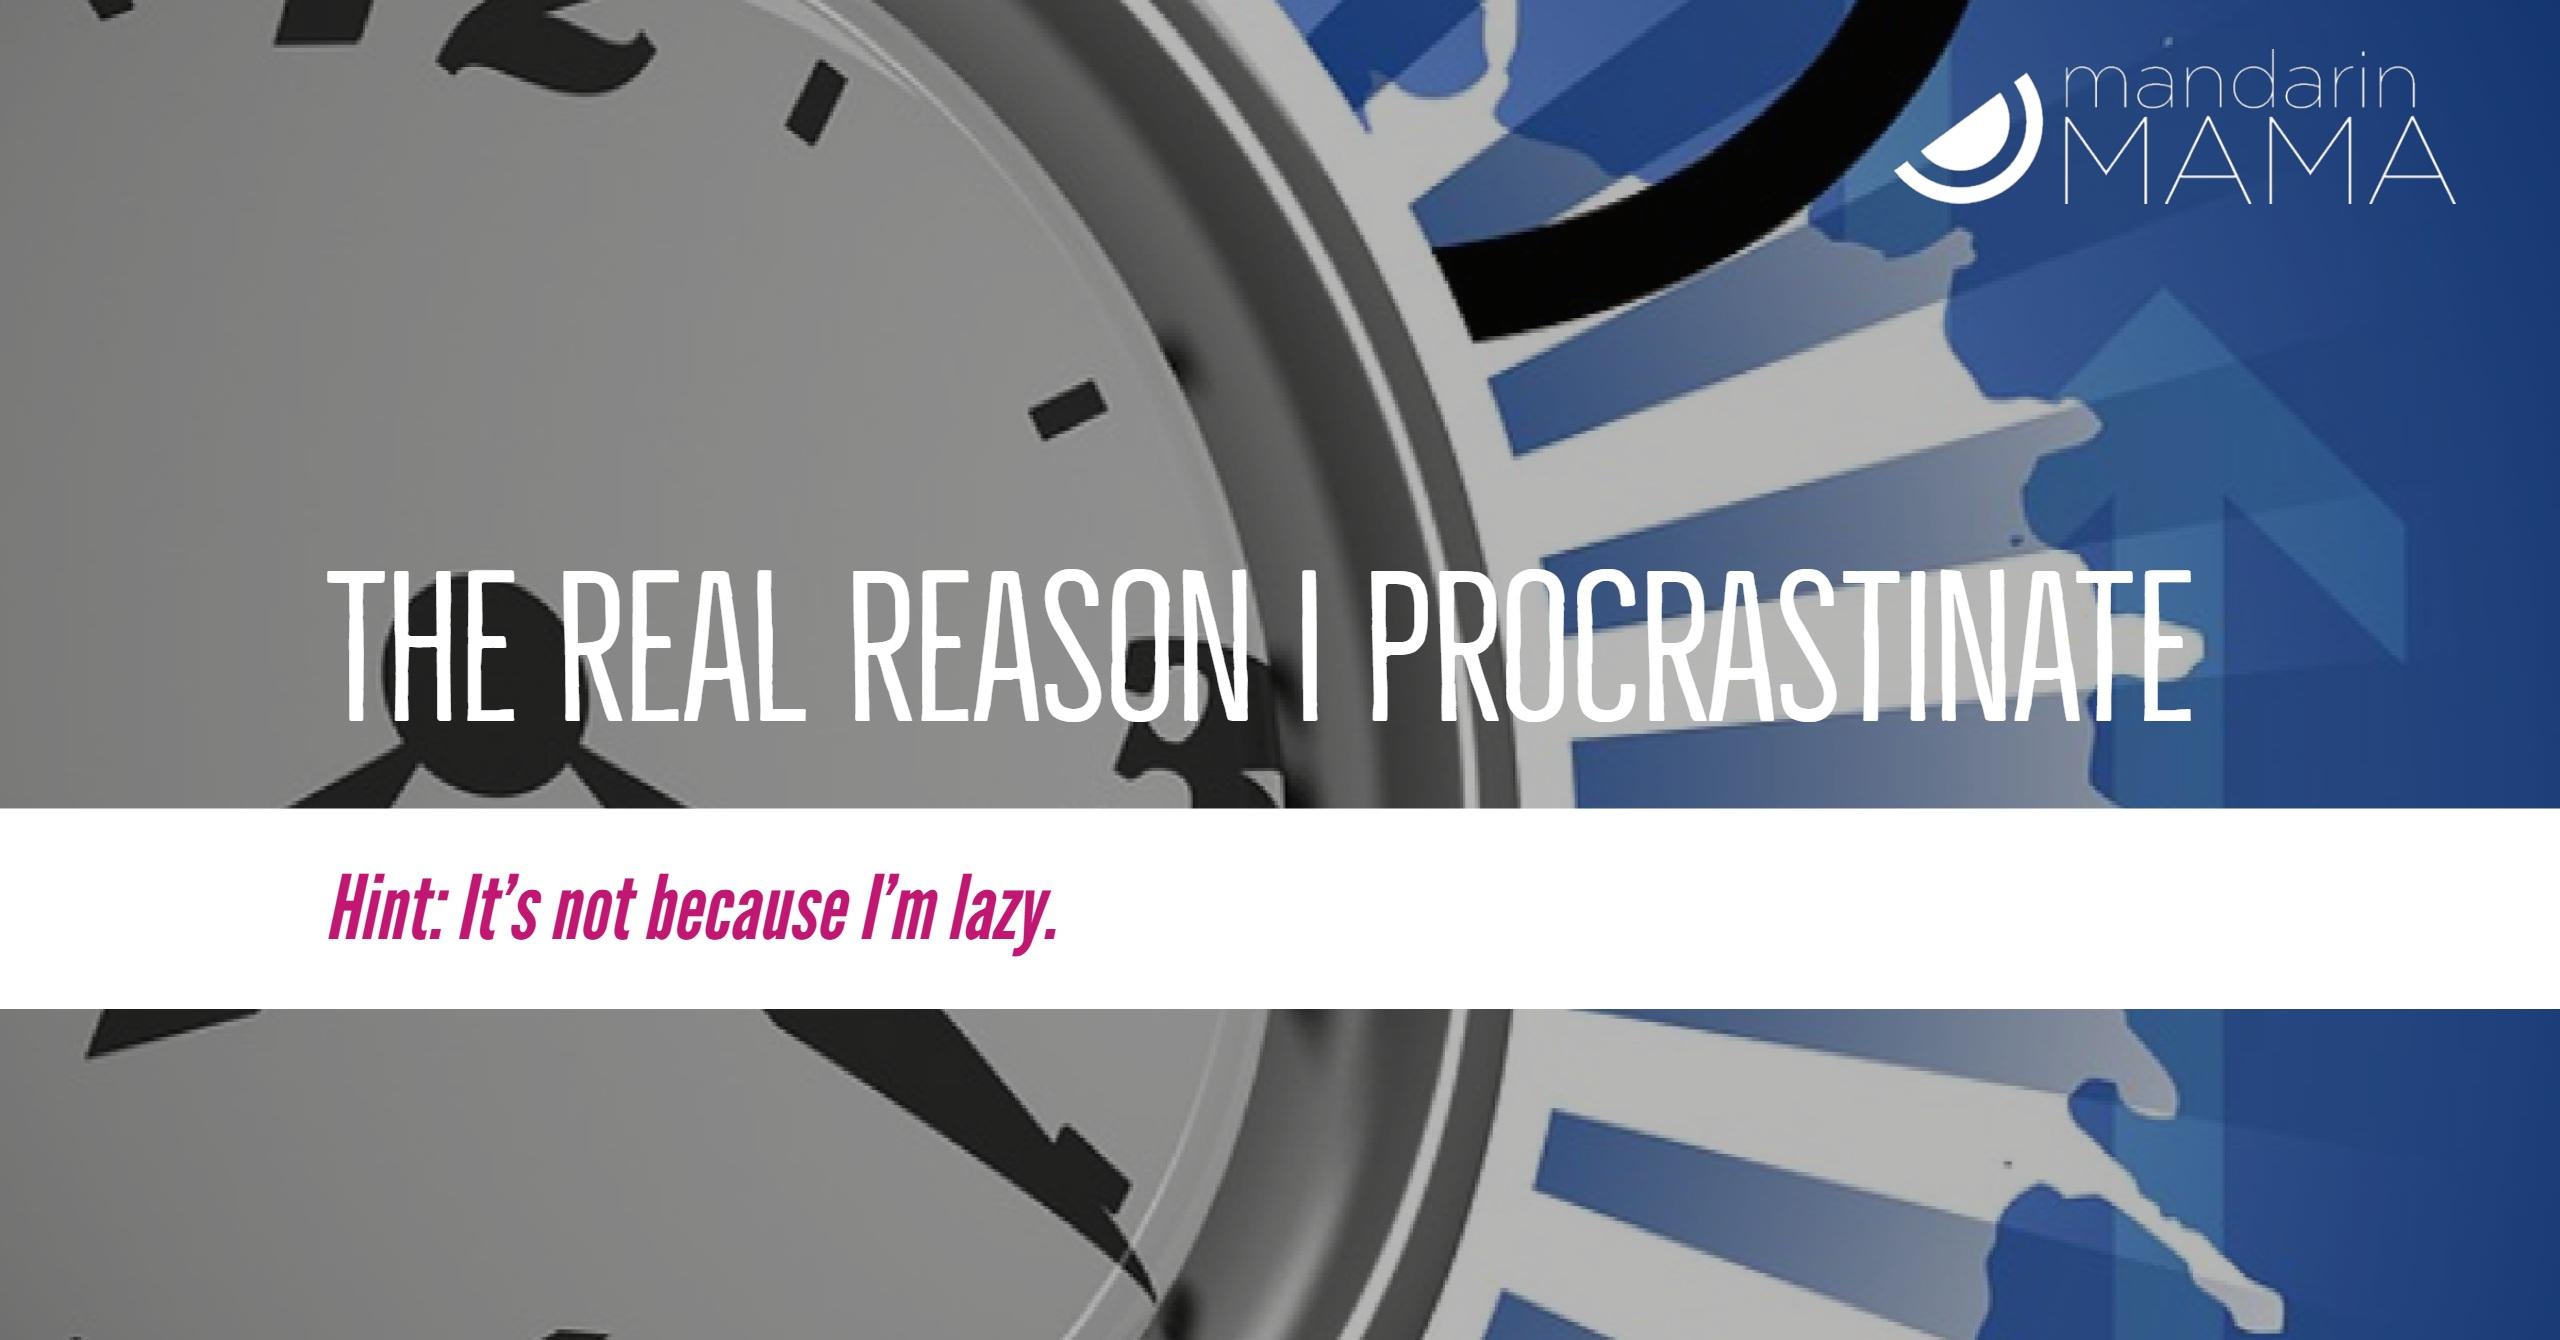 The Real Reason I Procrastinate